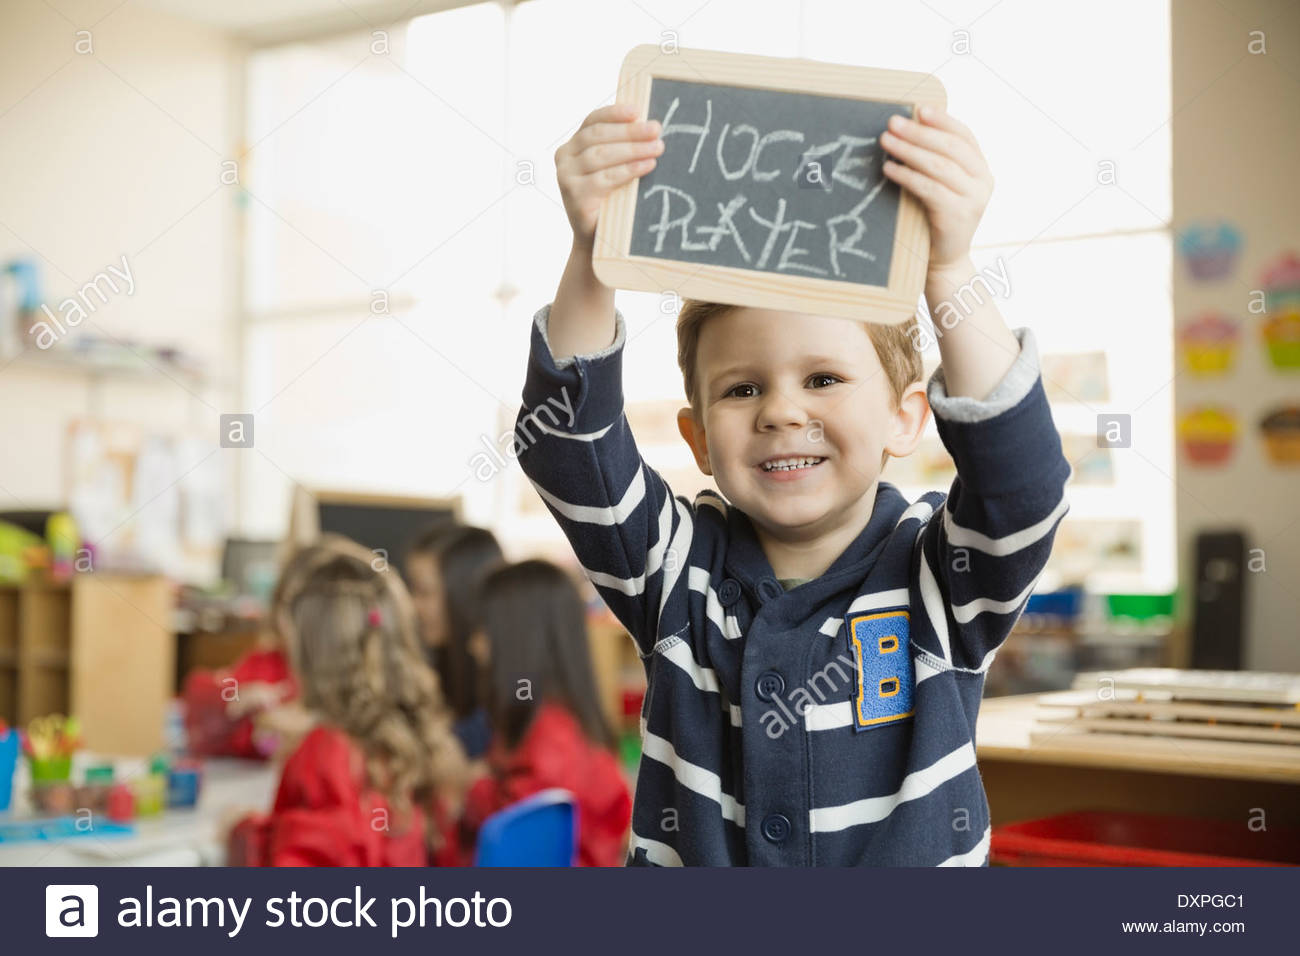 Smiling boy holding ardoise avec 'Hockey Player' écrit dessus Photo Stock